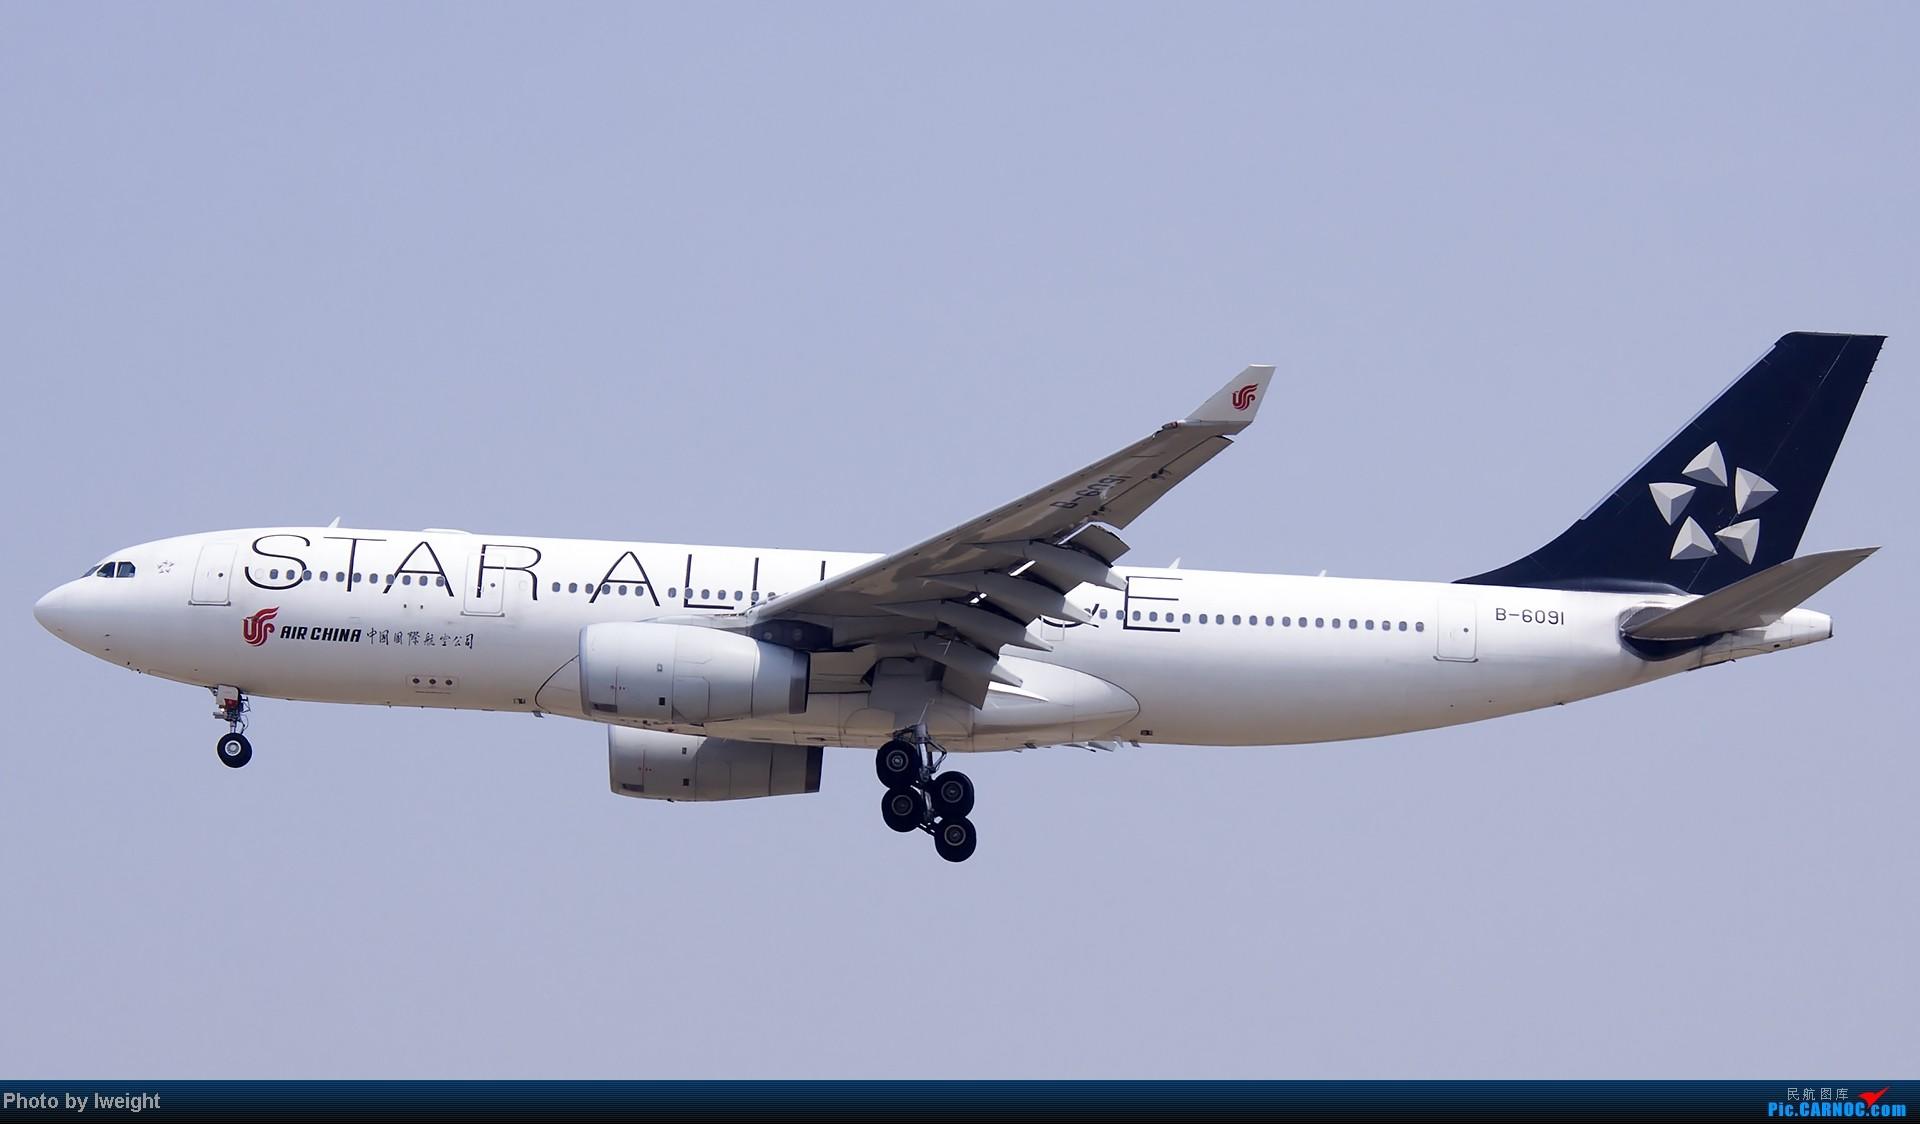 Re:[原创]错过了卡航的巴塞罗那号,只有这些大路货了,泪奔啊 AIRBUS A330-200 B-6091 中国北京首都机场